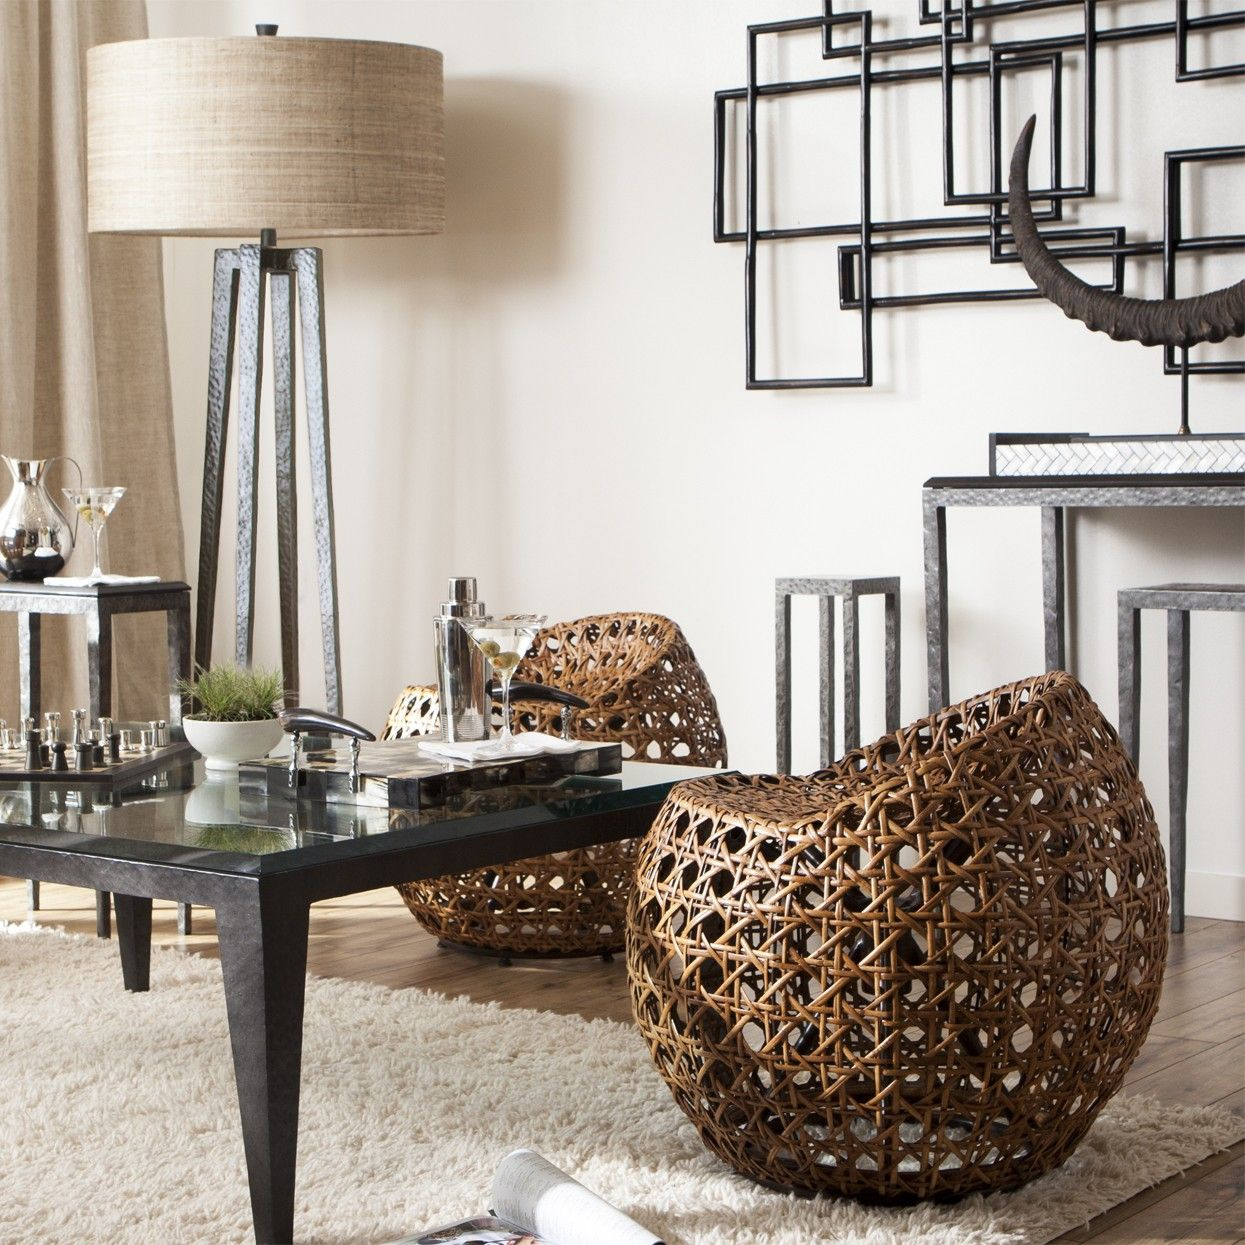 Manhattan Rattan Swivel Stool Furniture, Home